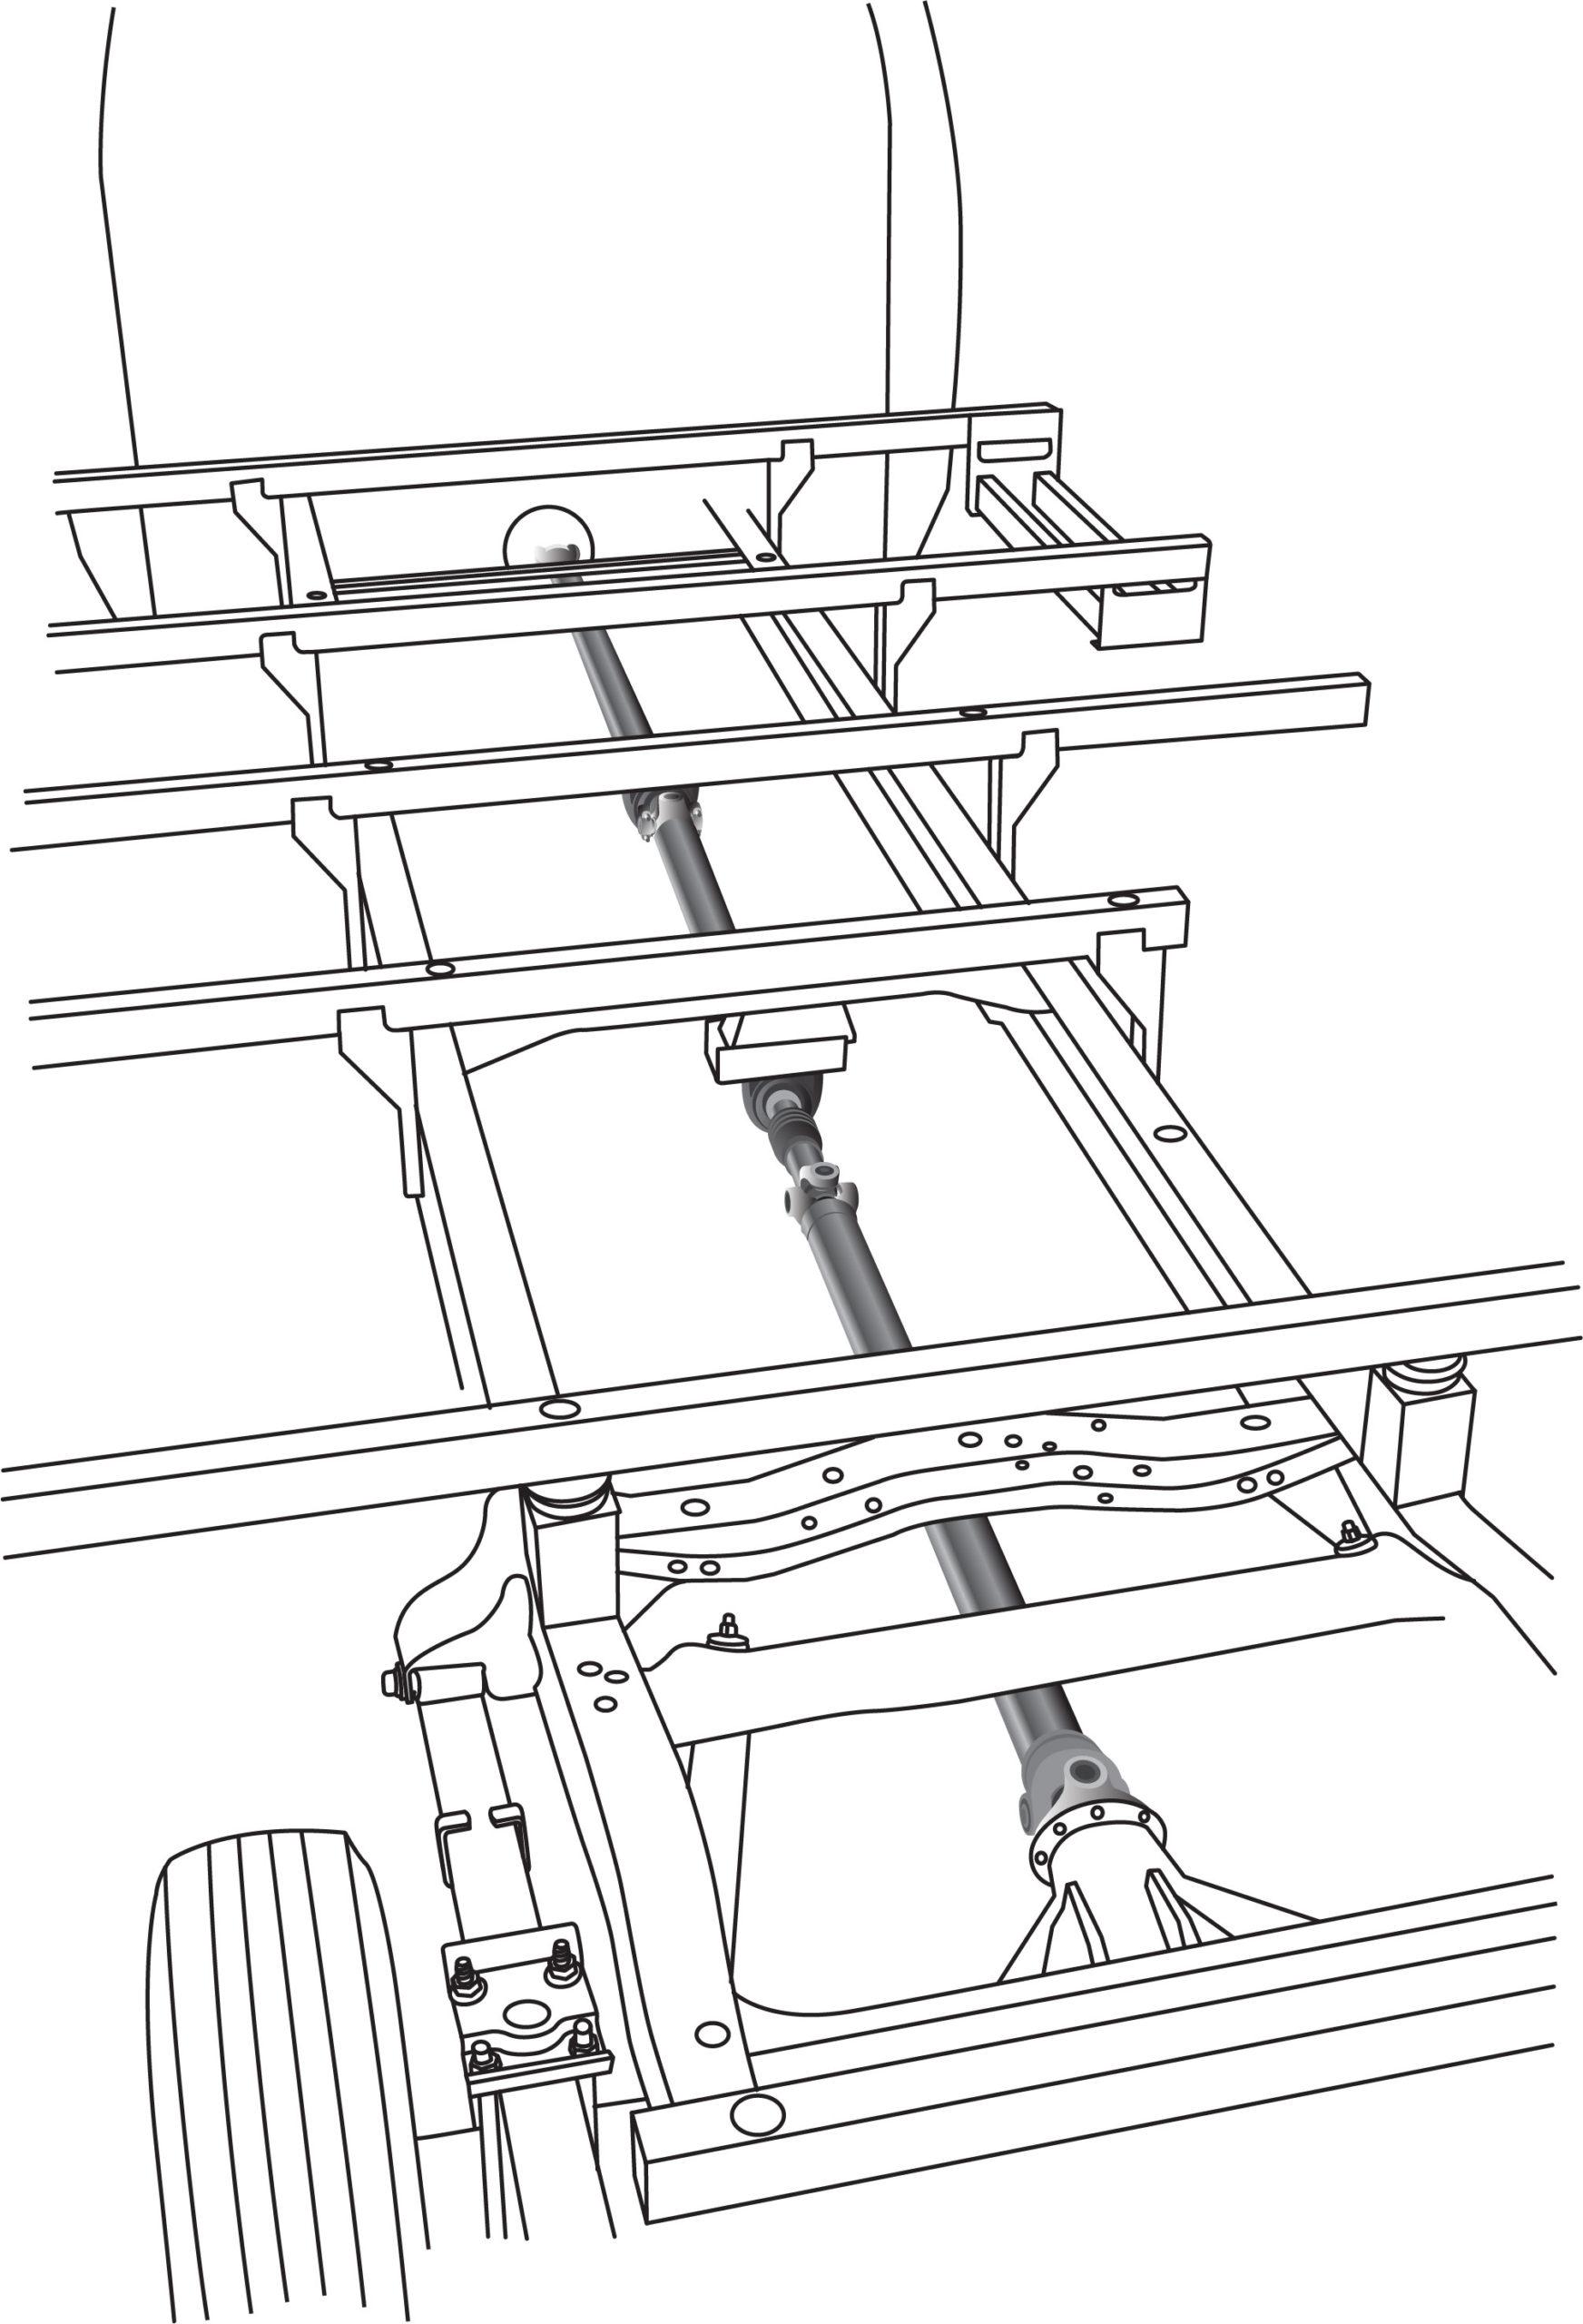 Driveshaft illustration